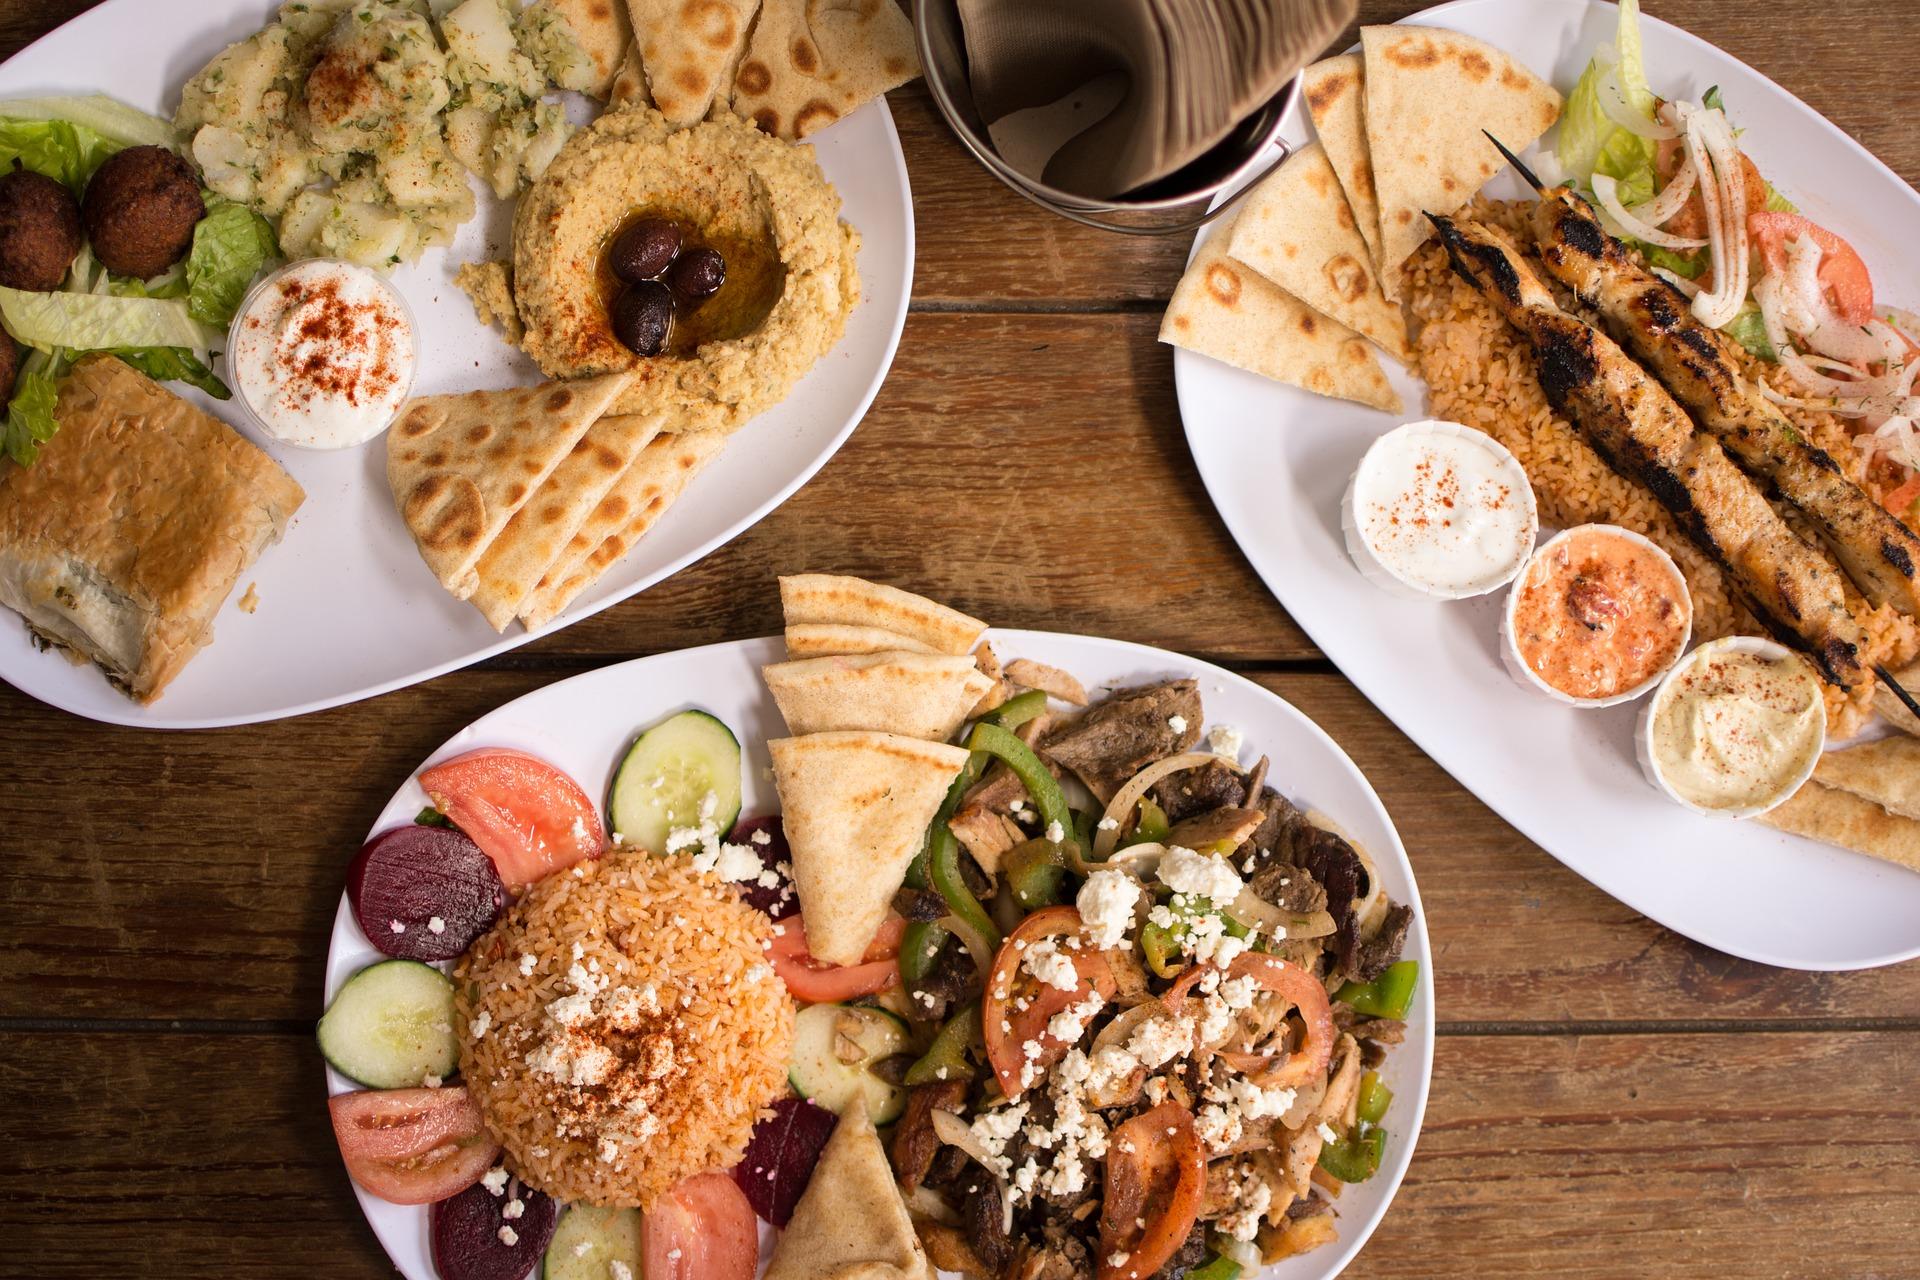 Image of food in the UAE